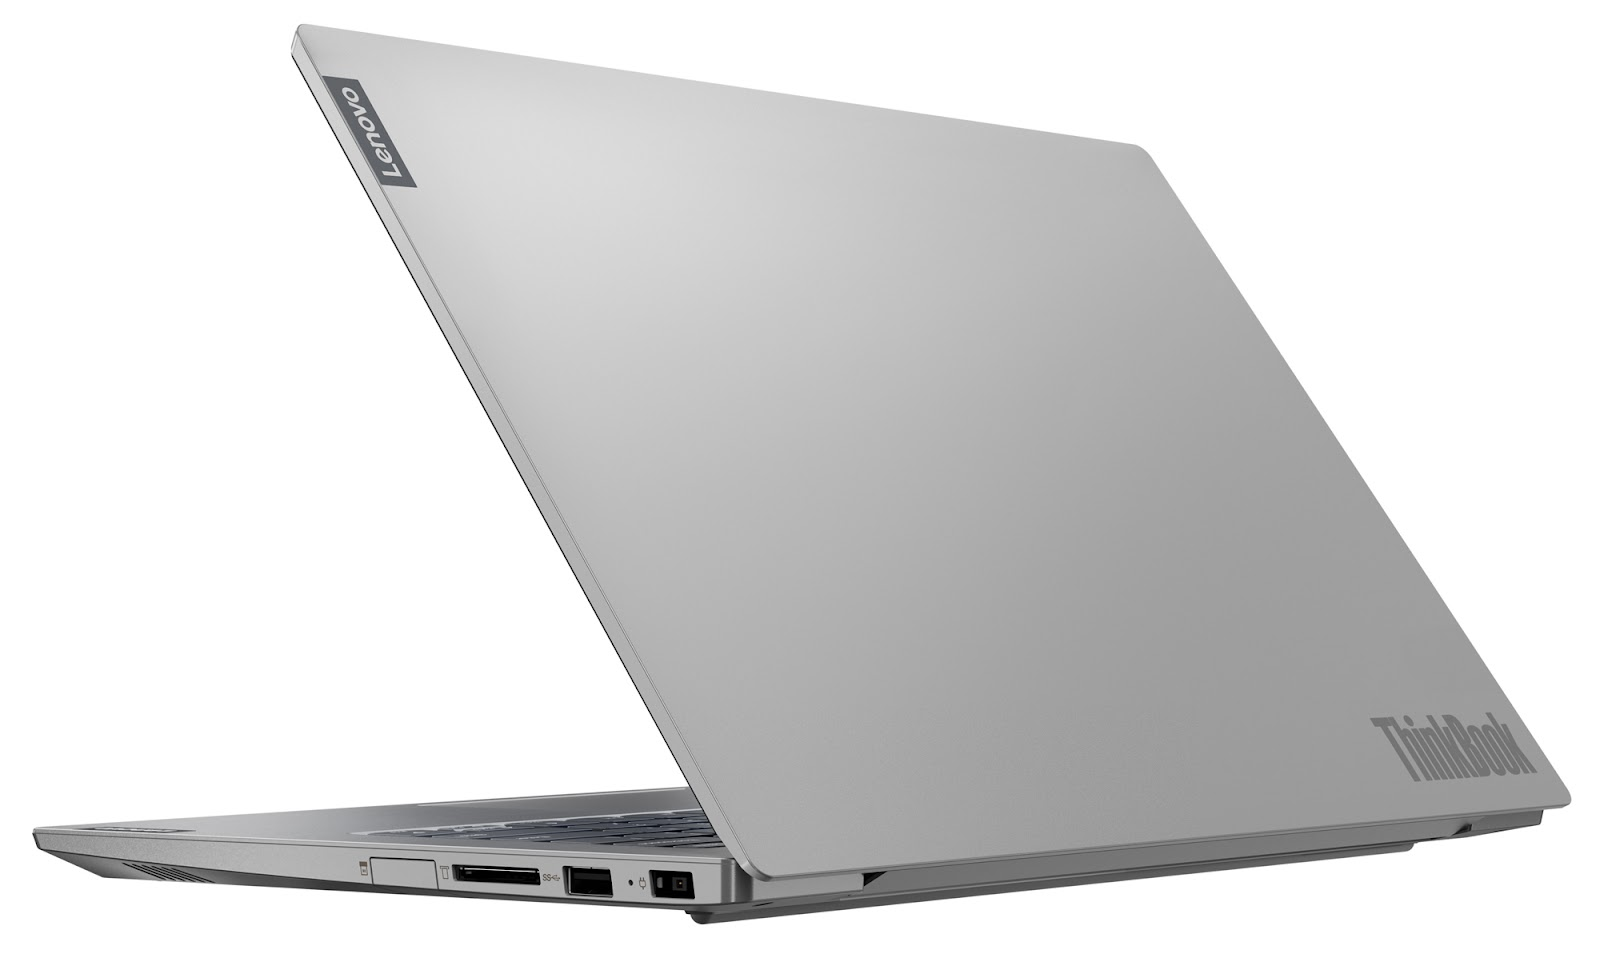 Фото 2. Ноутбук Lenovo ThinkBook 14 IIL (20SL00JURU)